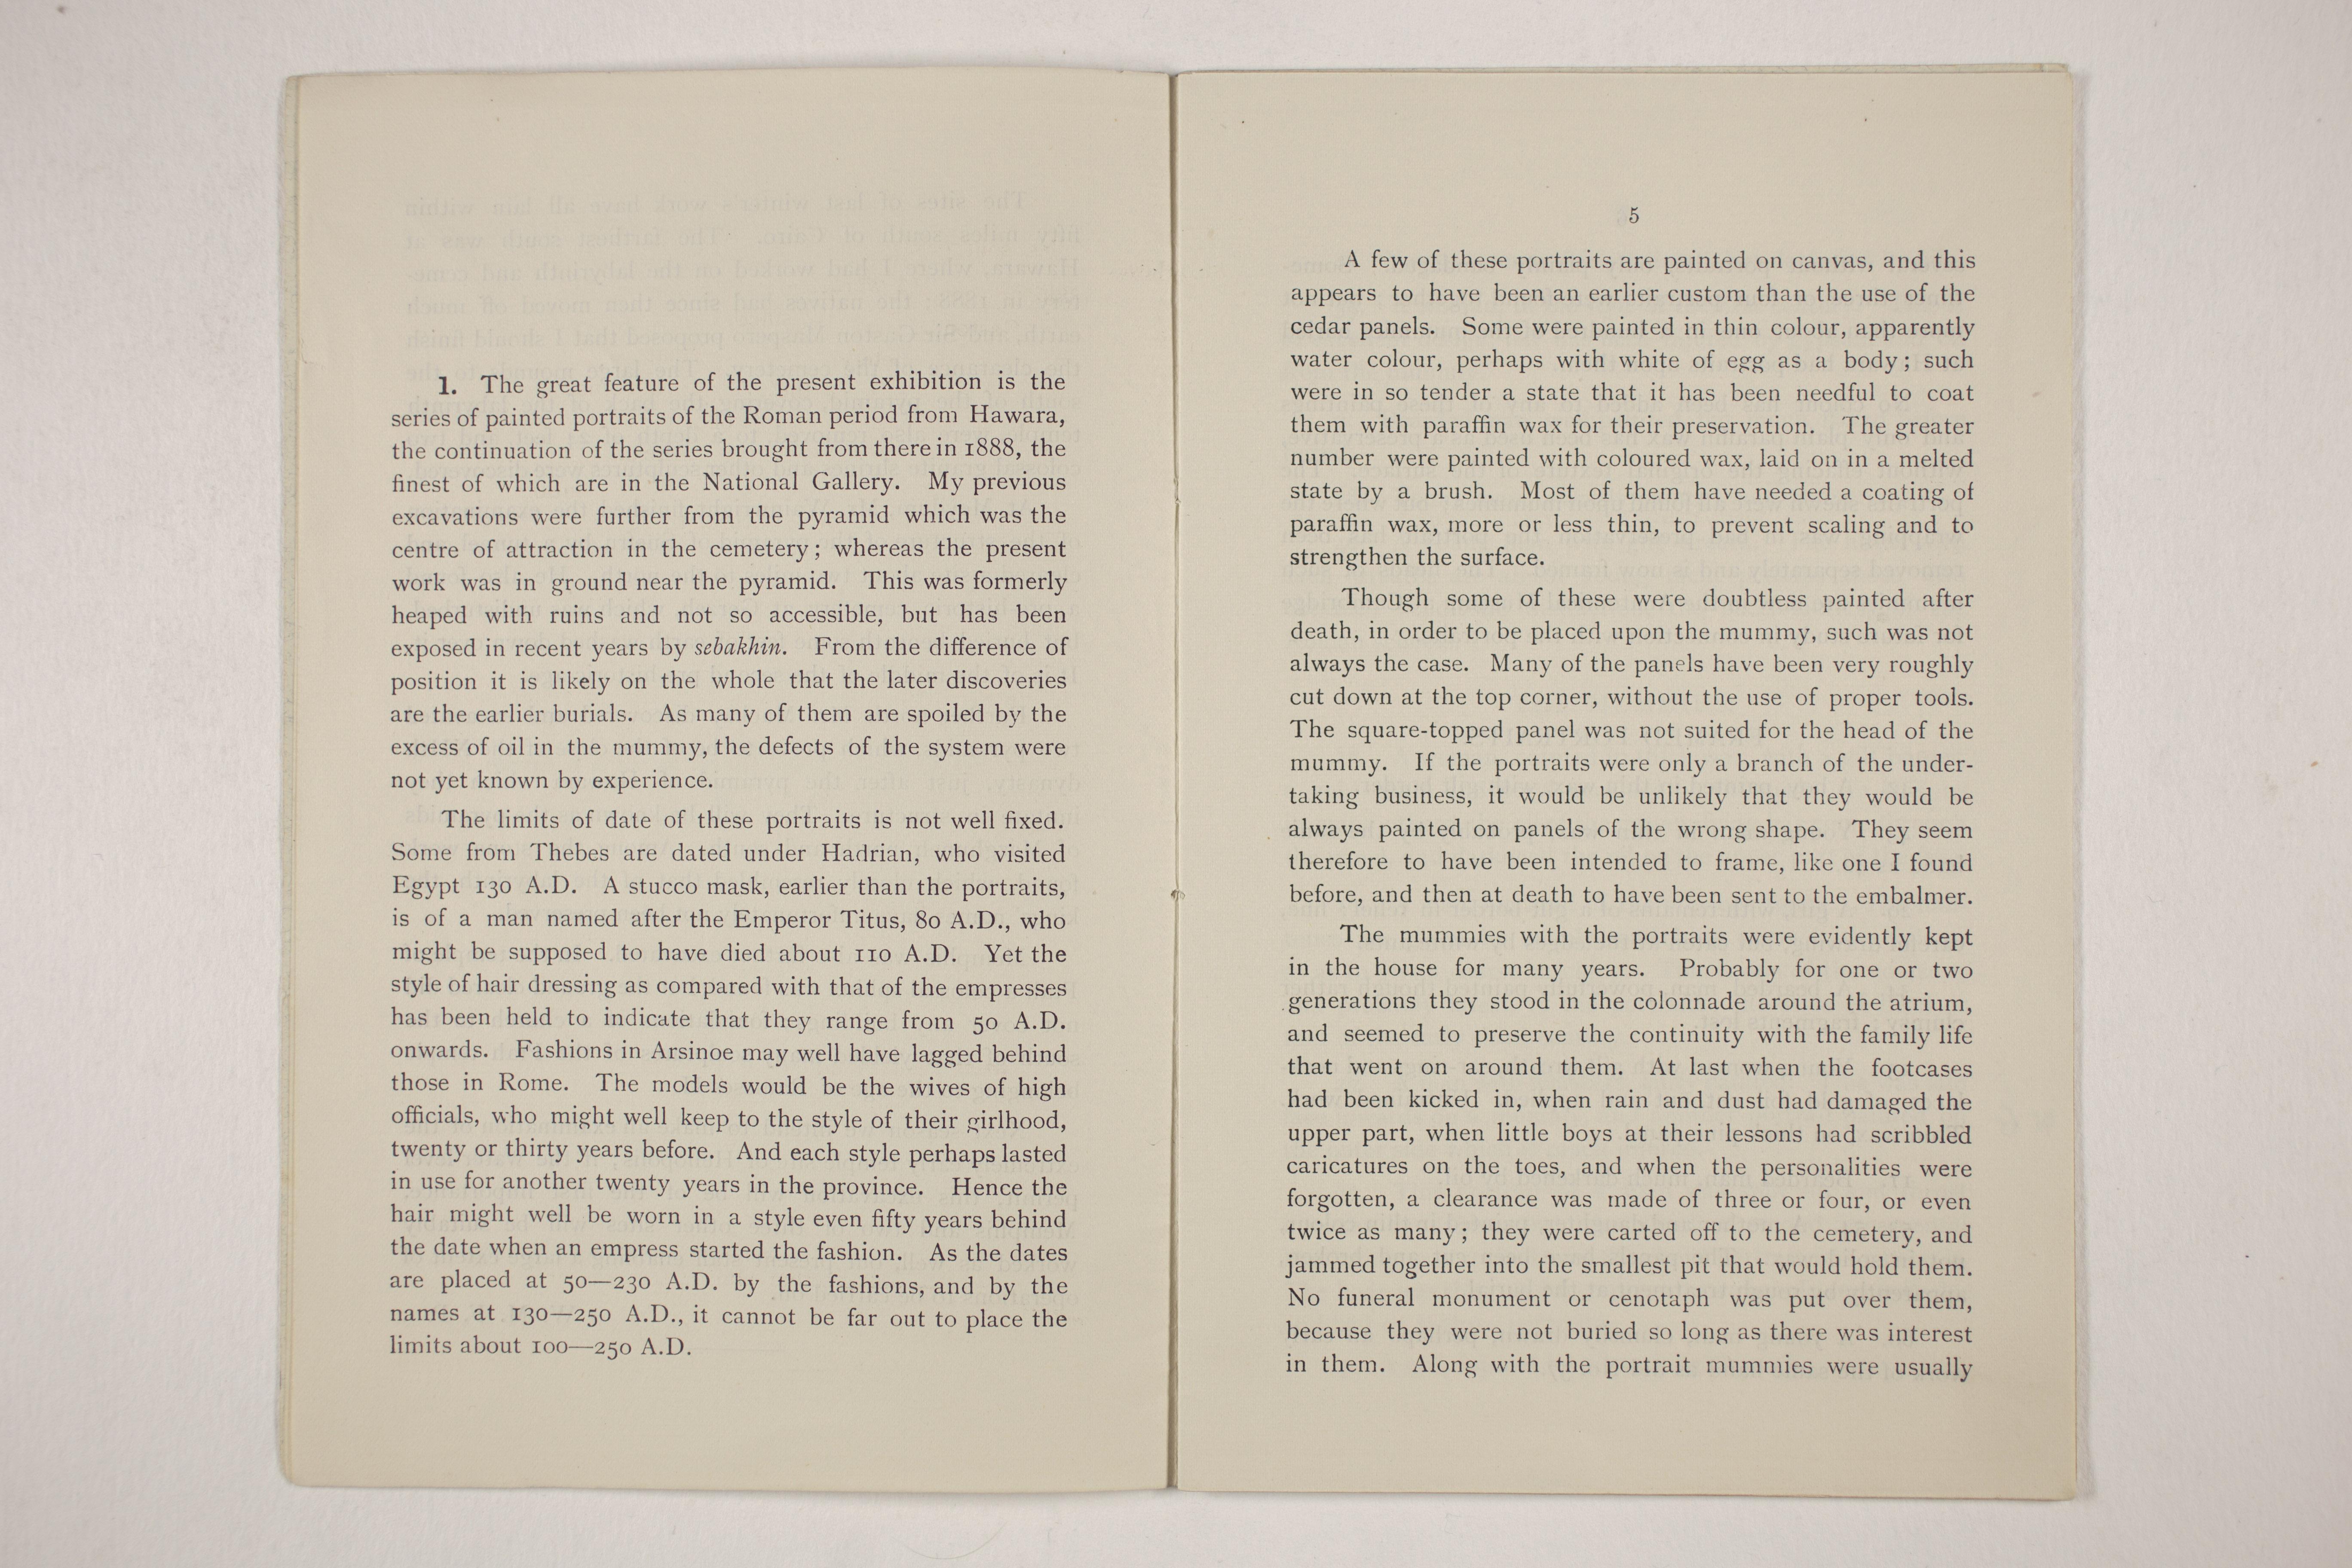 1910-11 Hawara, Gerzeh, Memphis, Mazghuneh Exhibition catalogue PMA/WFP1/D/19/33.4